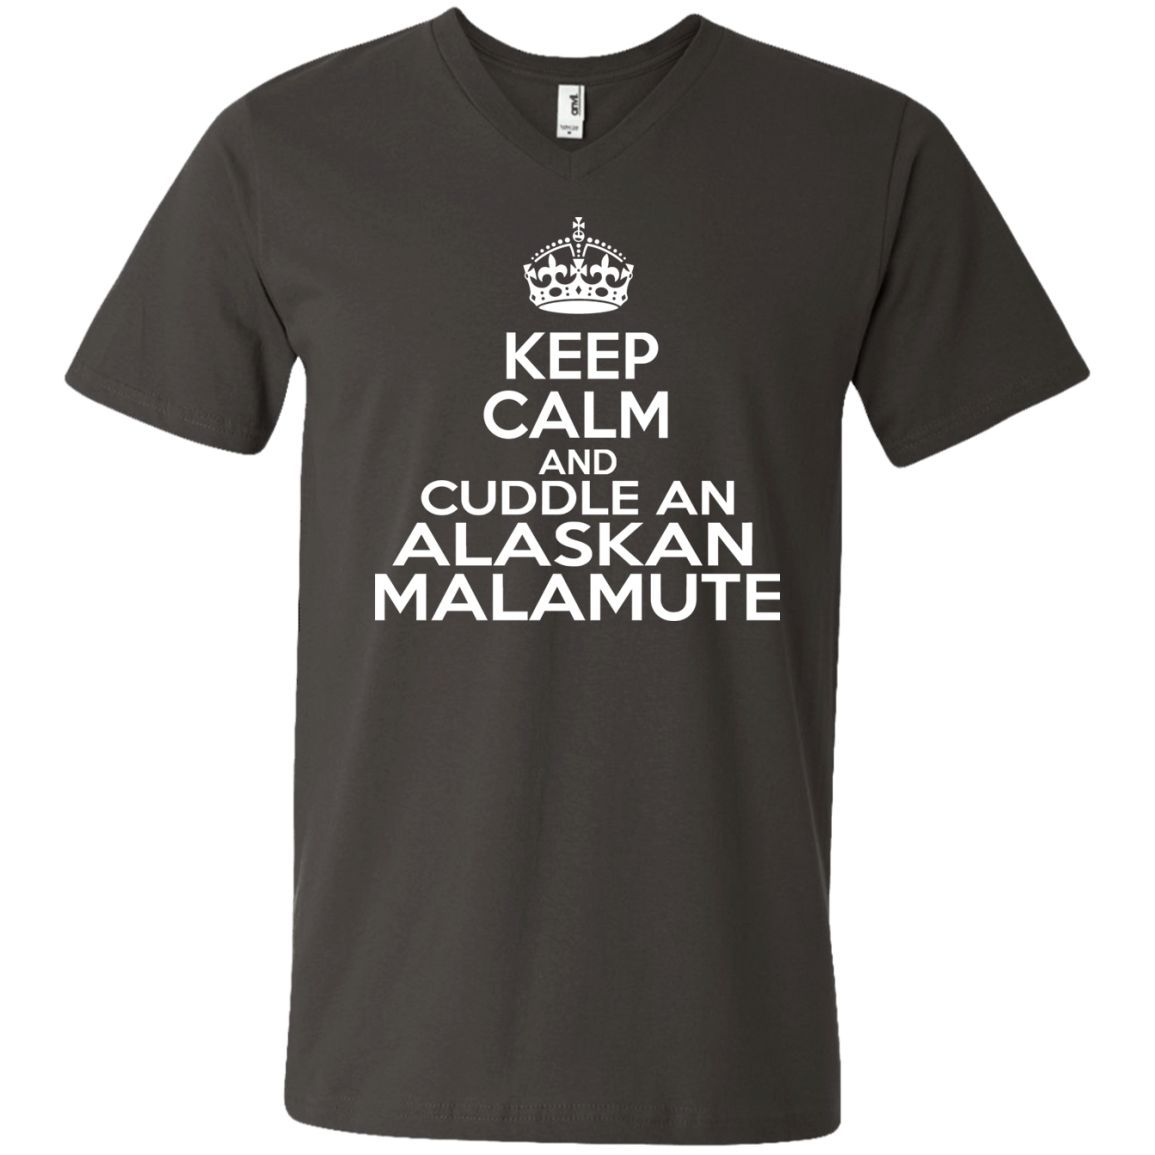 Keep Calm And Cuddle An Alaskan Malamute V Neck Tees